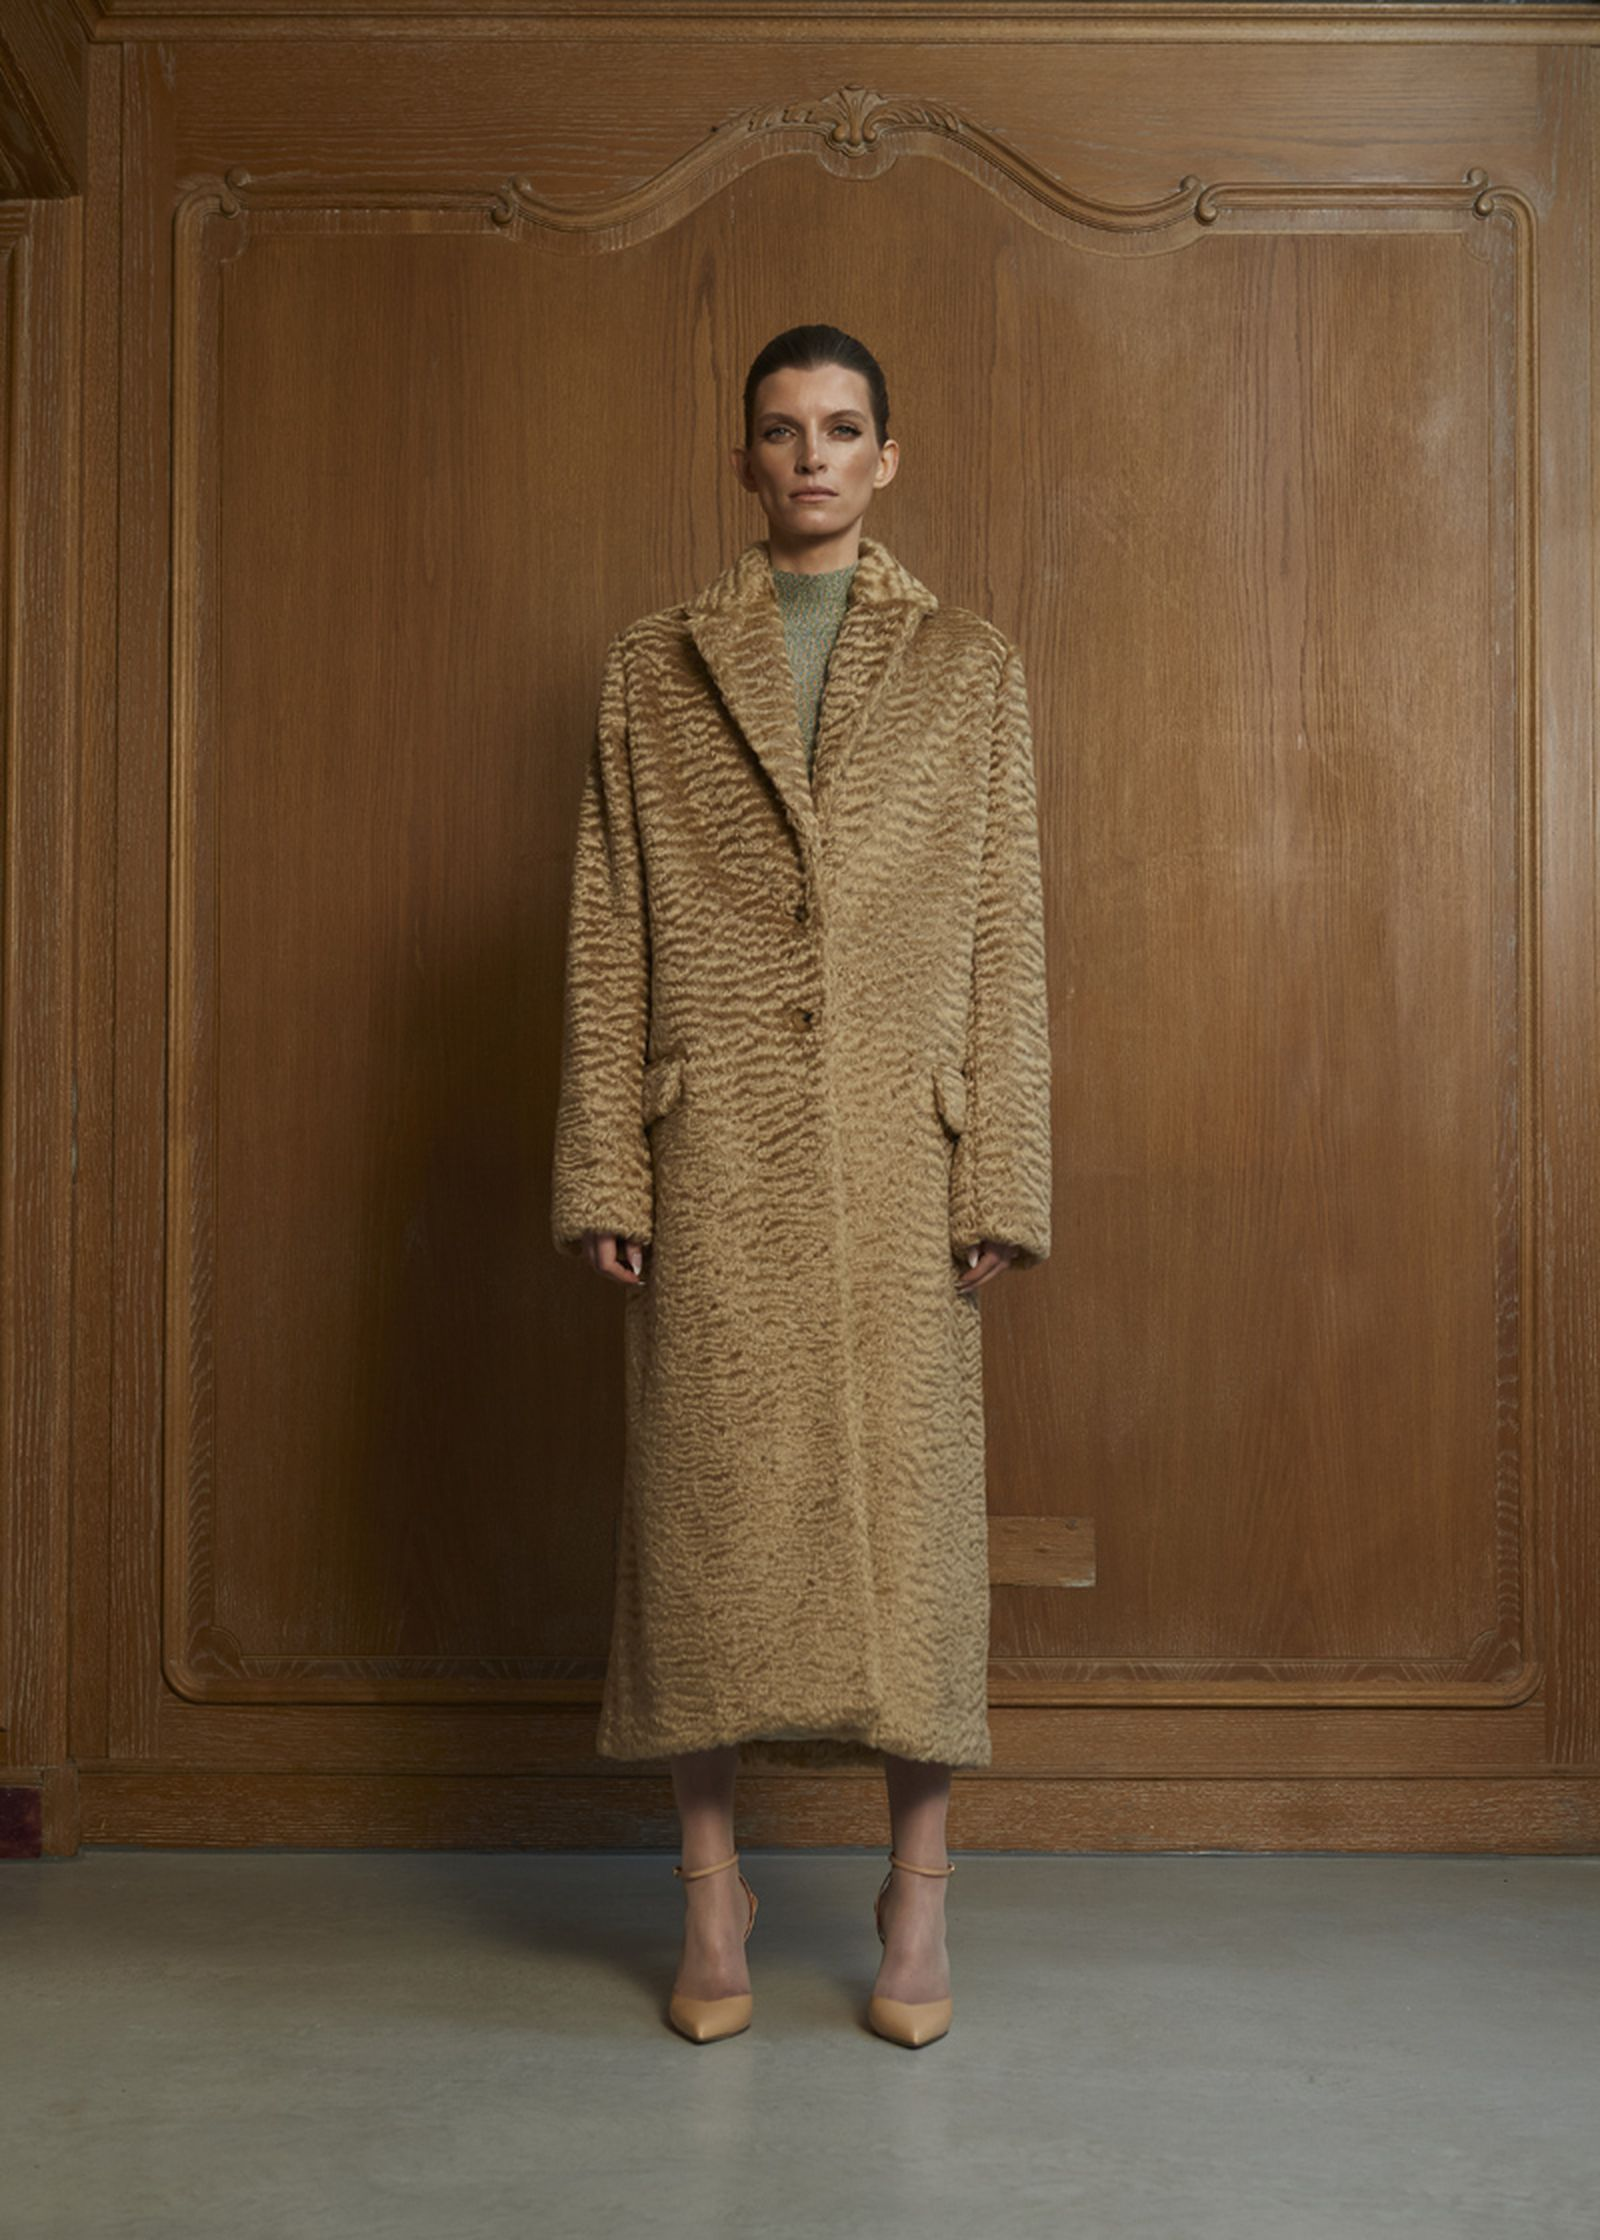 032c-rtw-womenswear-collection-paris-15